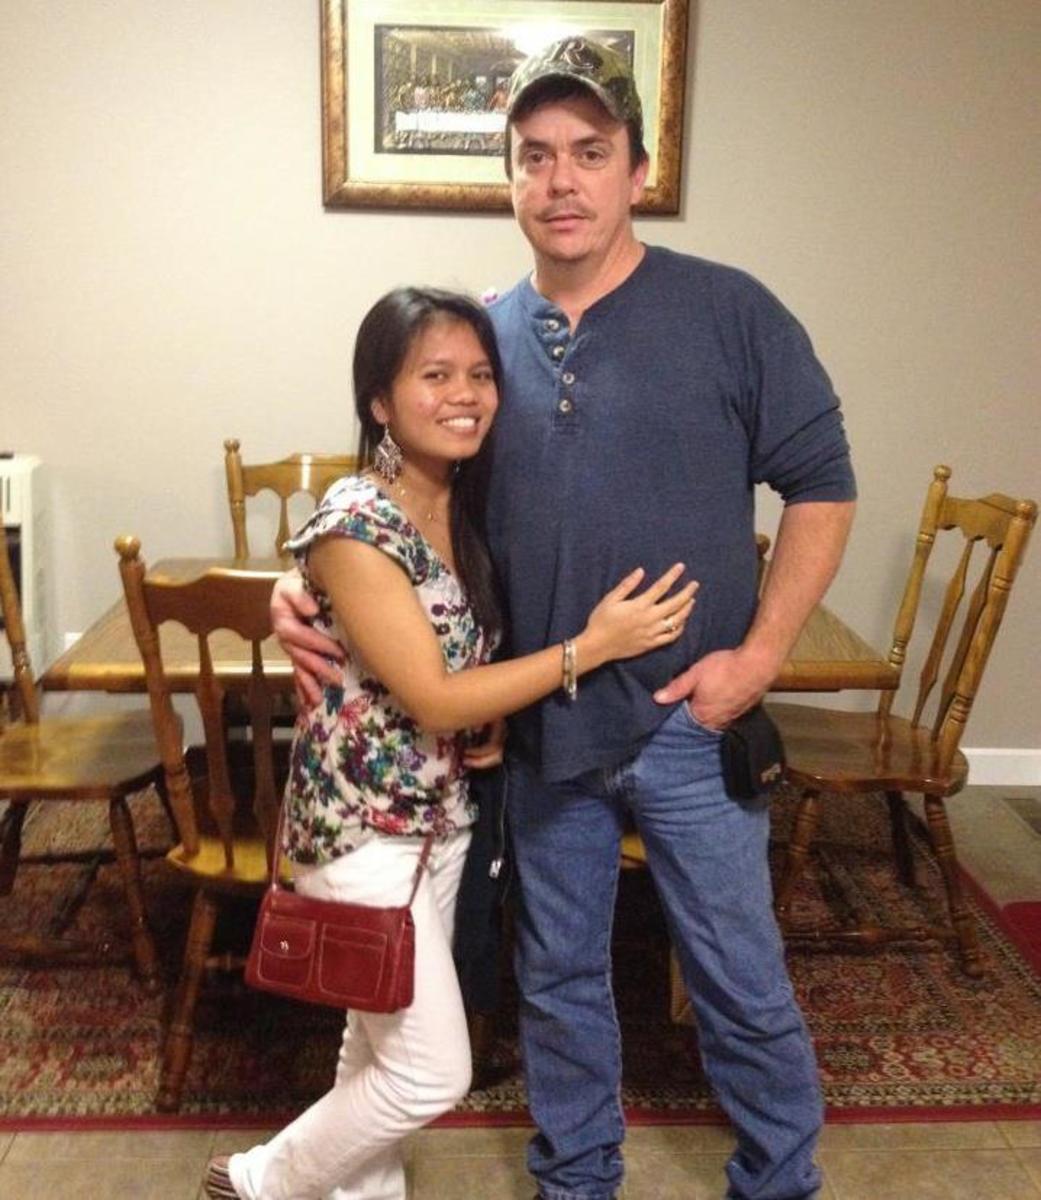 LOVERS JOURNEY: K1 VISA-FIANCEE's US EMBASSY INTERVIEW PREPARATION